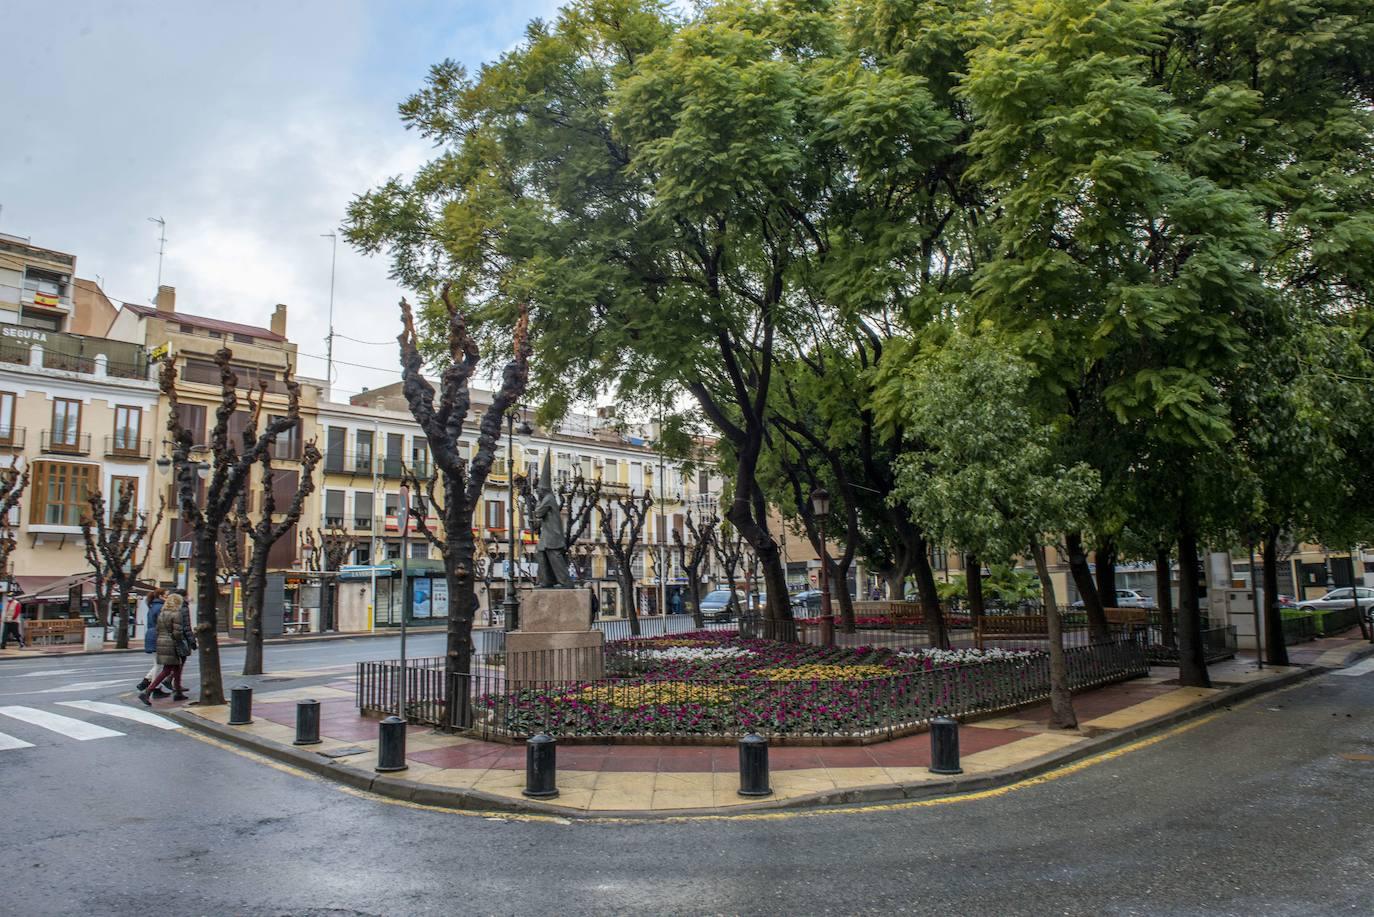 The Plaza de Camachos in Murcia, this Monday.